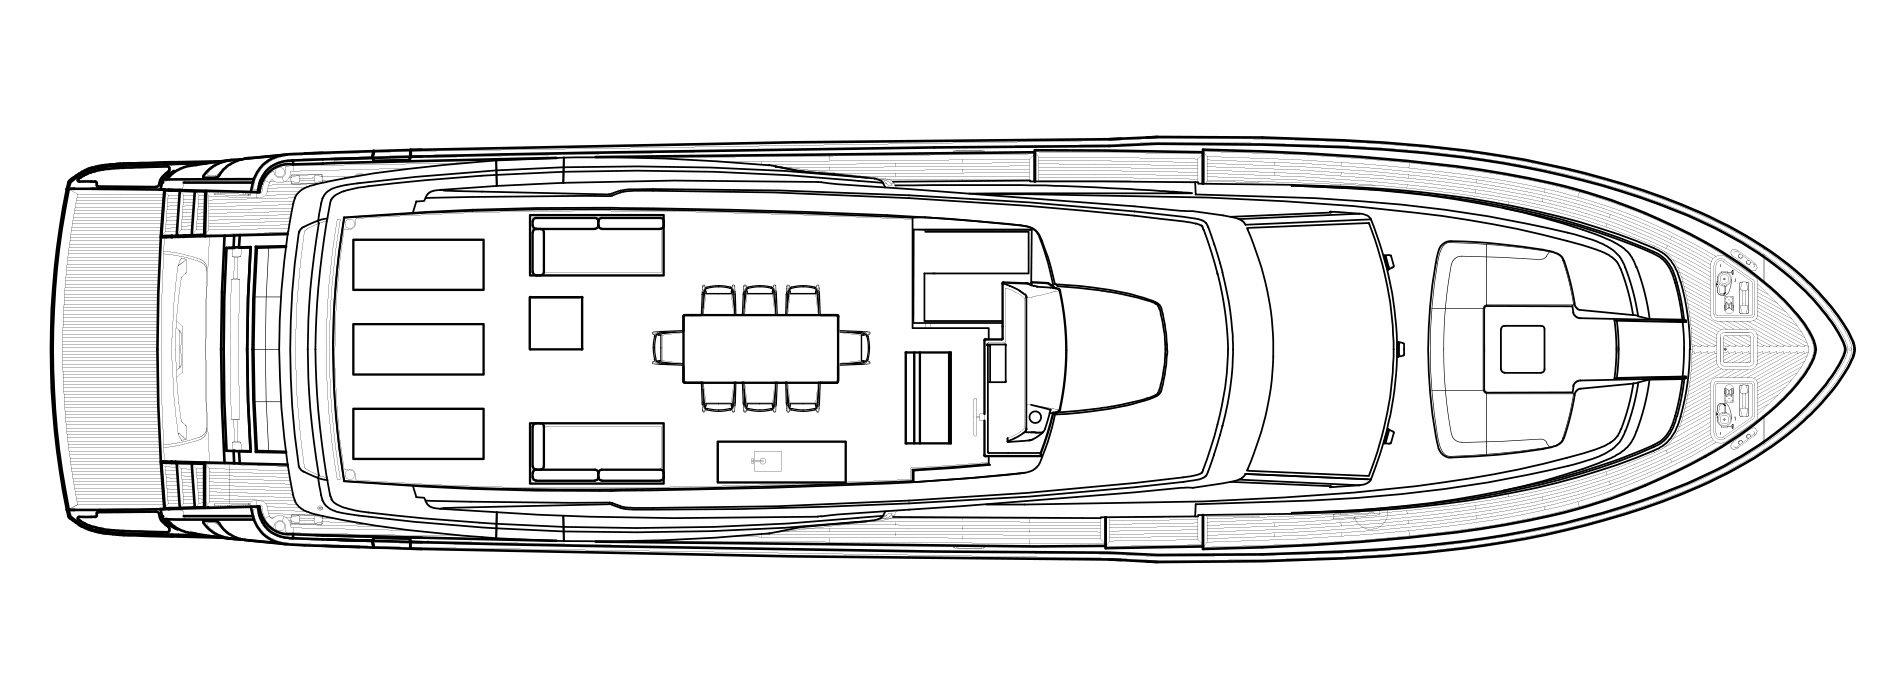 Sanlorenzo Yachts SL86 飞桥 Versione USA